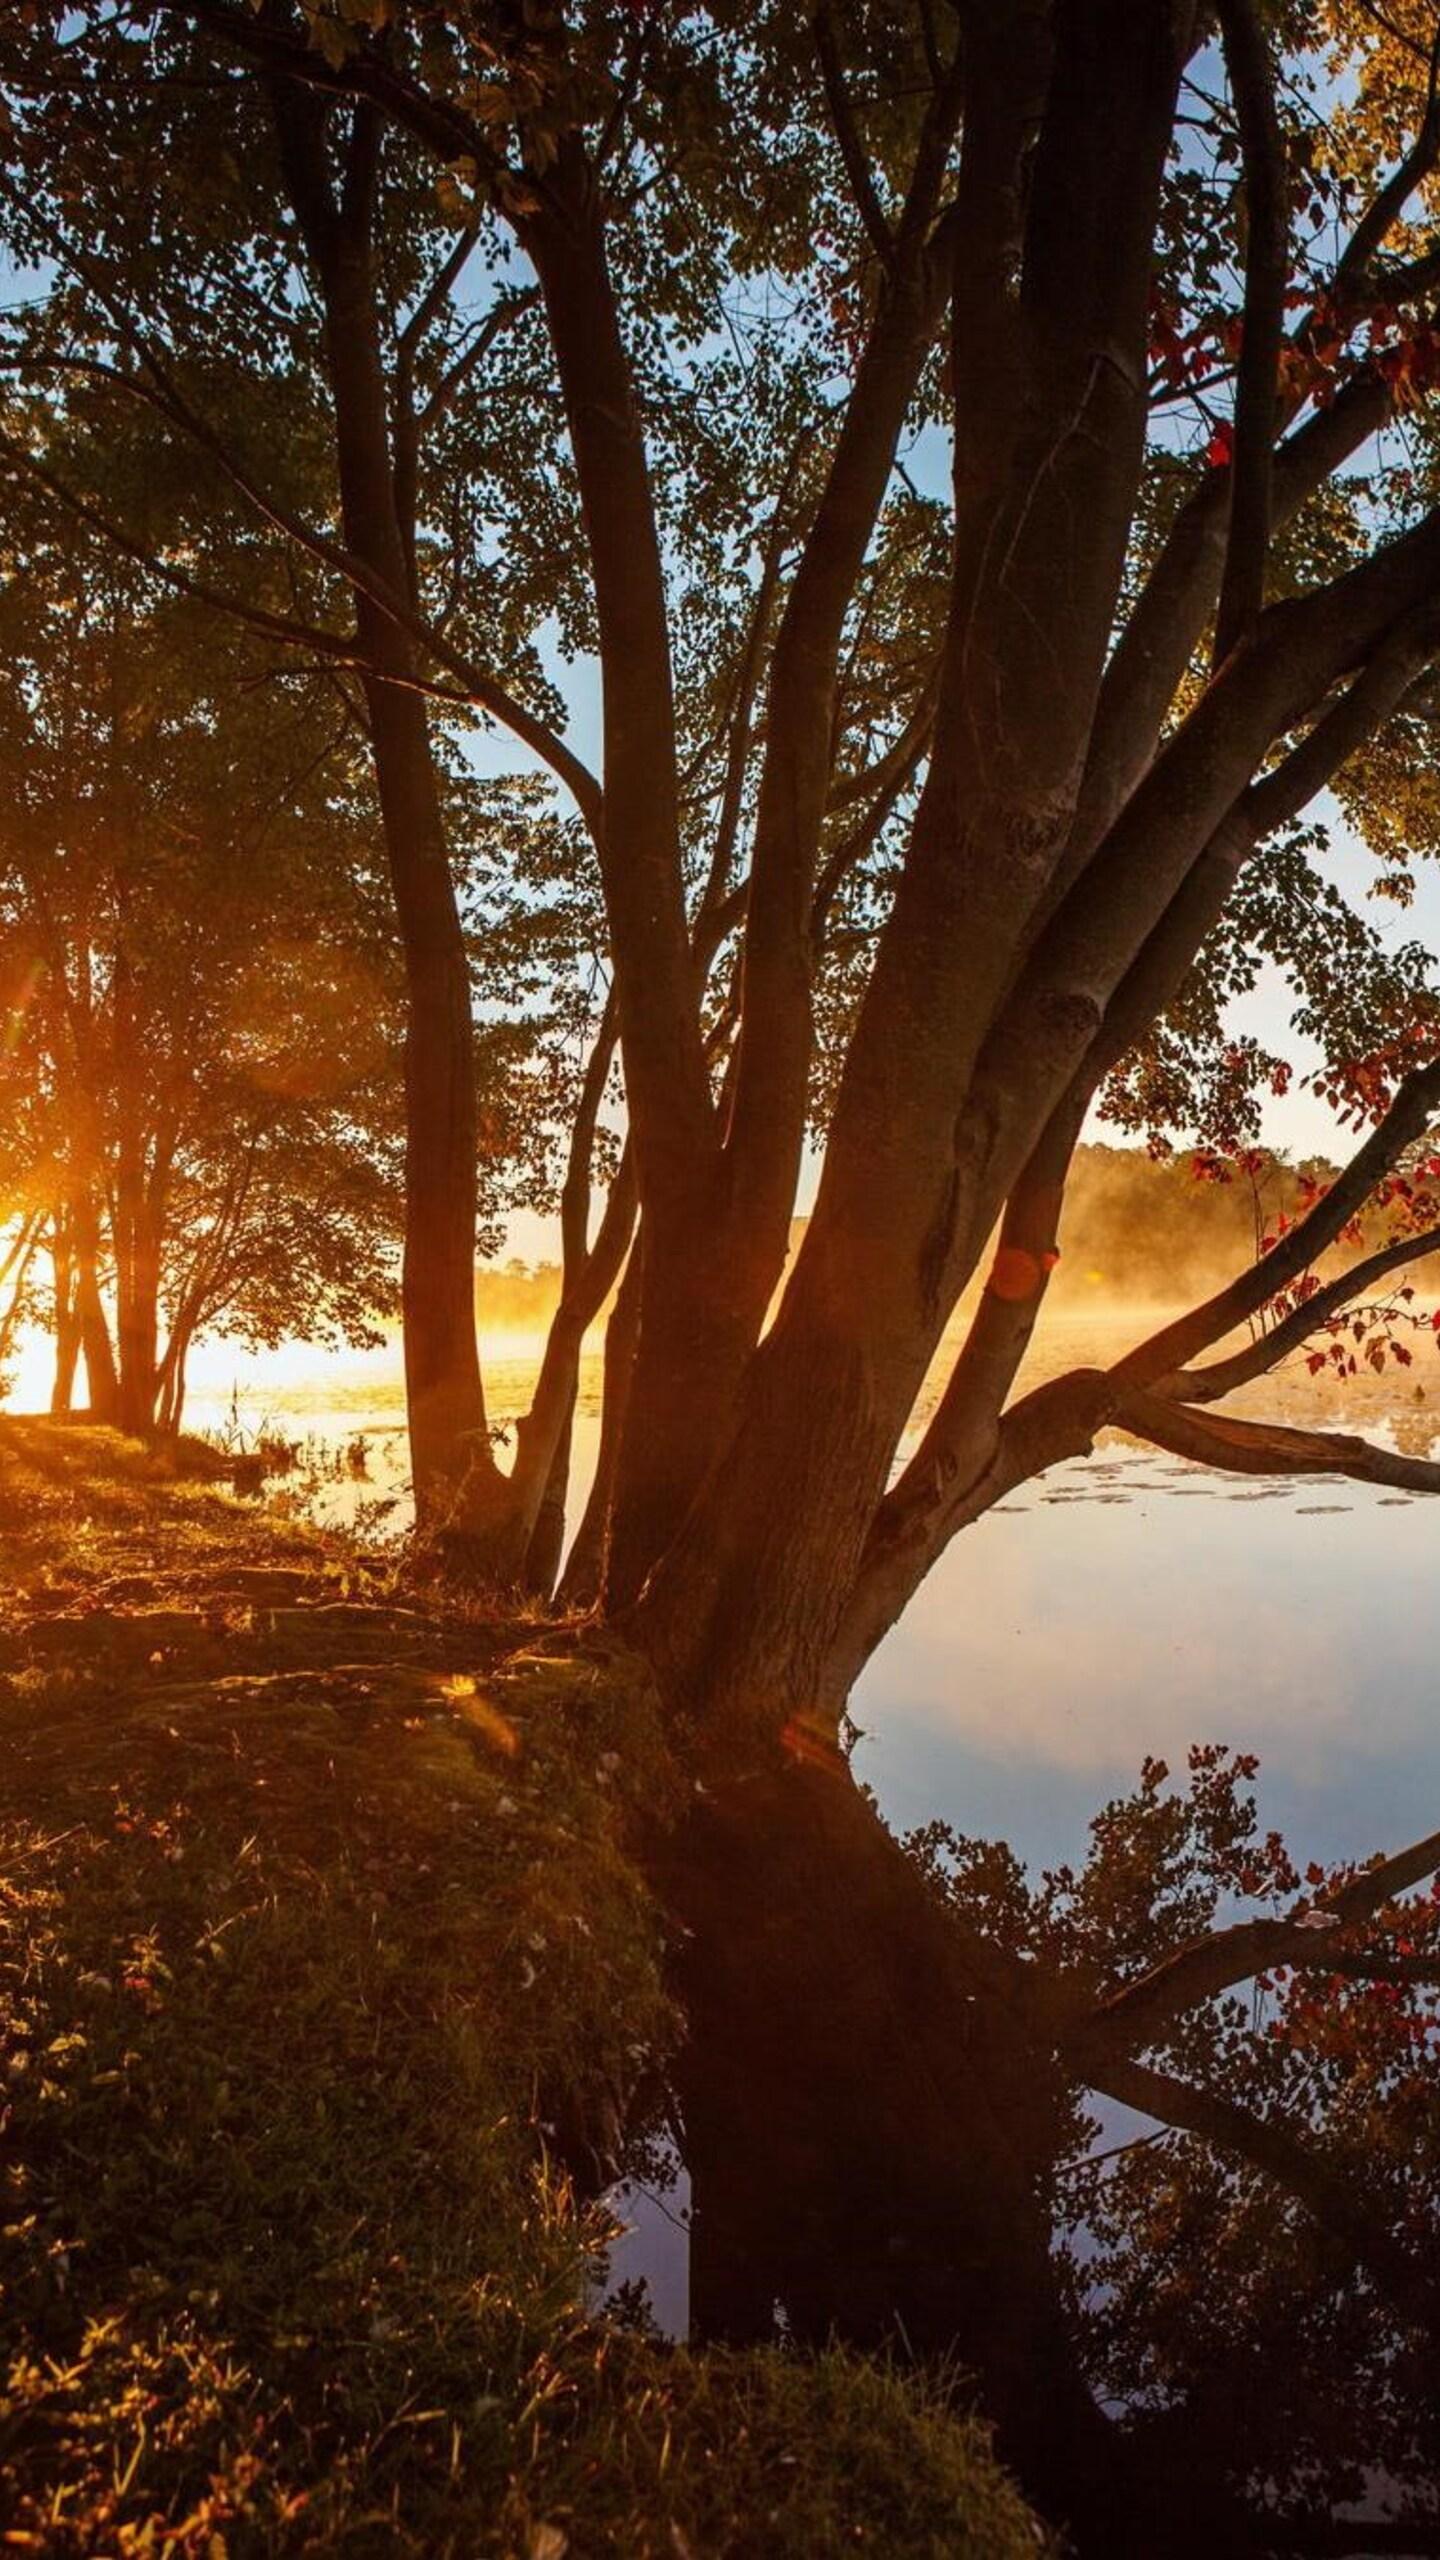 lake-tree-reflection-wide.jpg